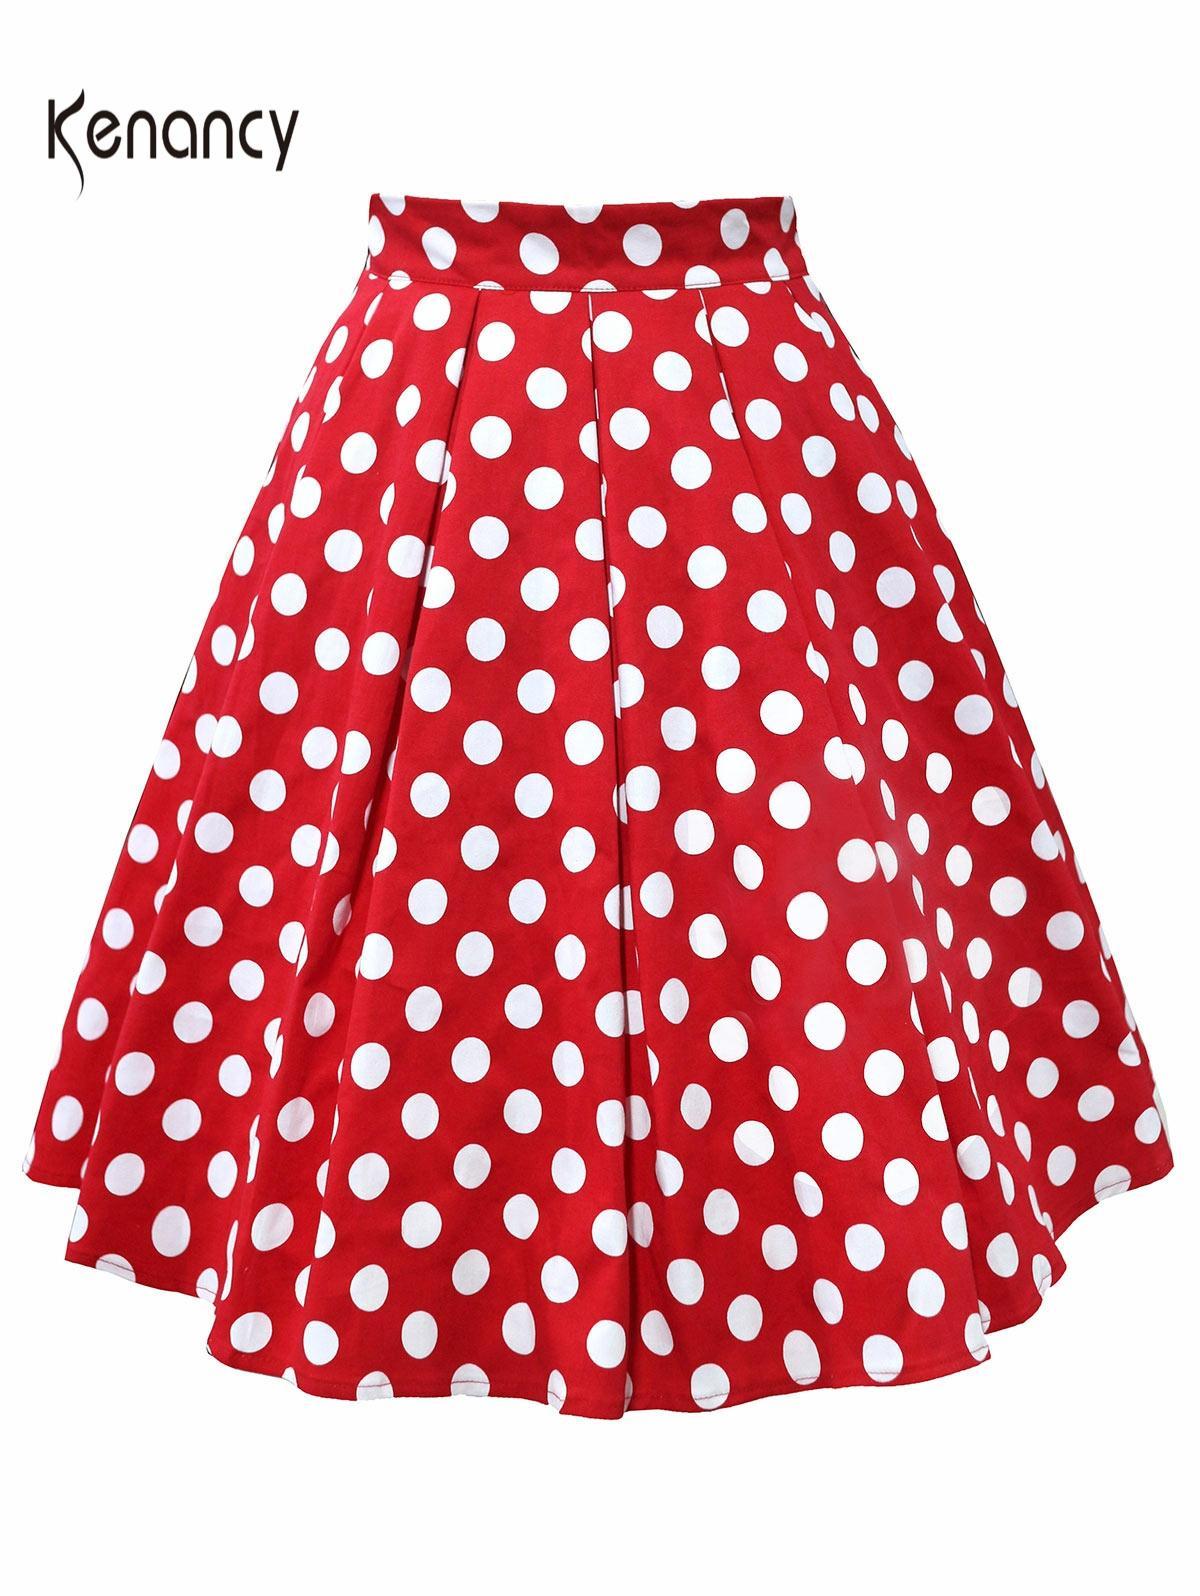 Kenancy Women Cotton Summer Skirt Red Black White Polka Dot High Waist Vintage Tutu Skater Faldas Mujer Casual Swing Midi Skirts